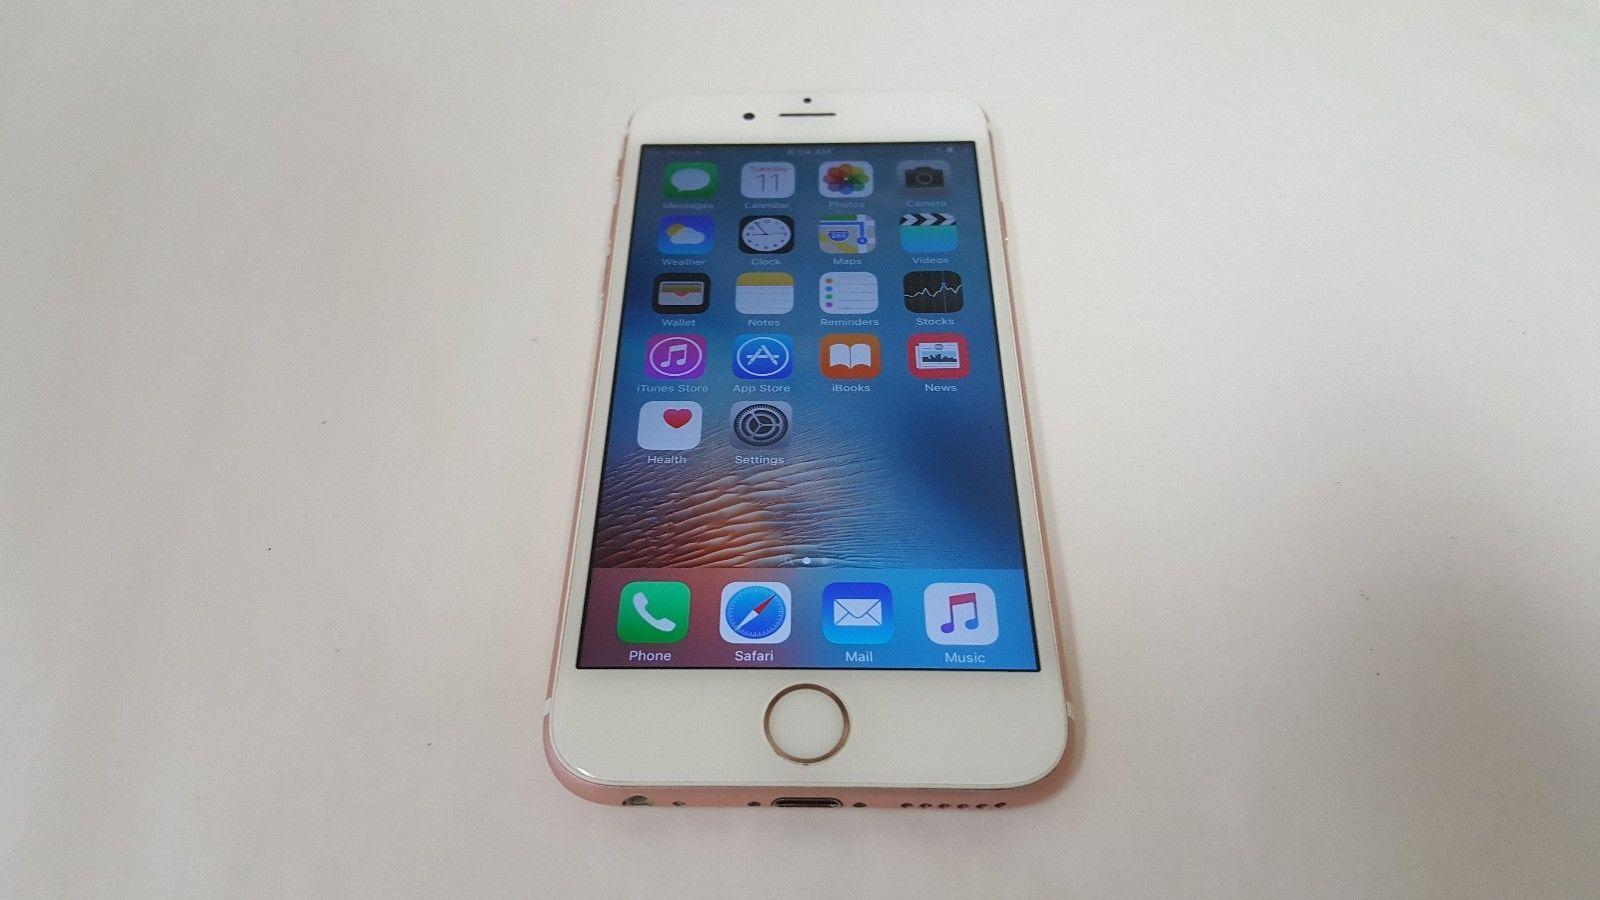 Apple iPhone 6s (Latest Model) - 16GB - Rose Gold (Sprint) Smartphone Clean ESN | eBay